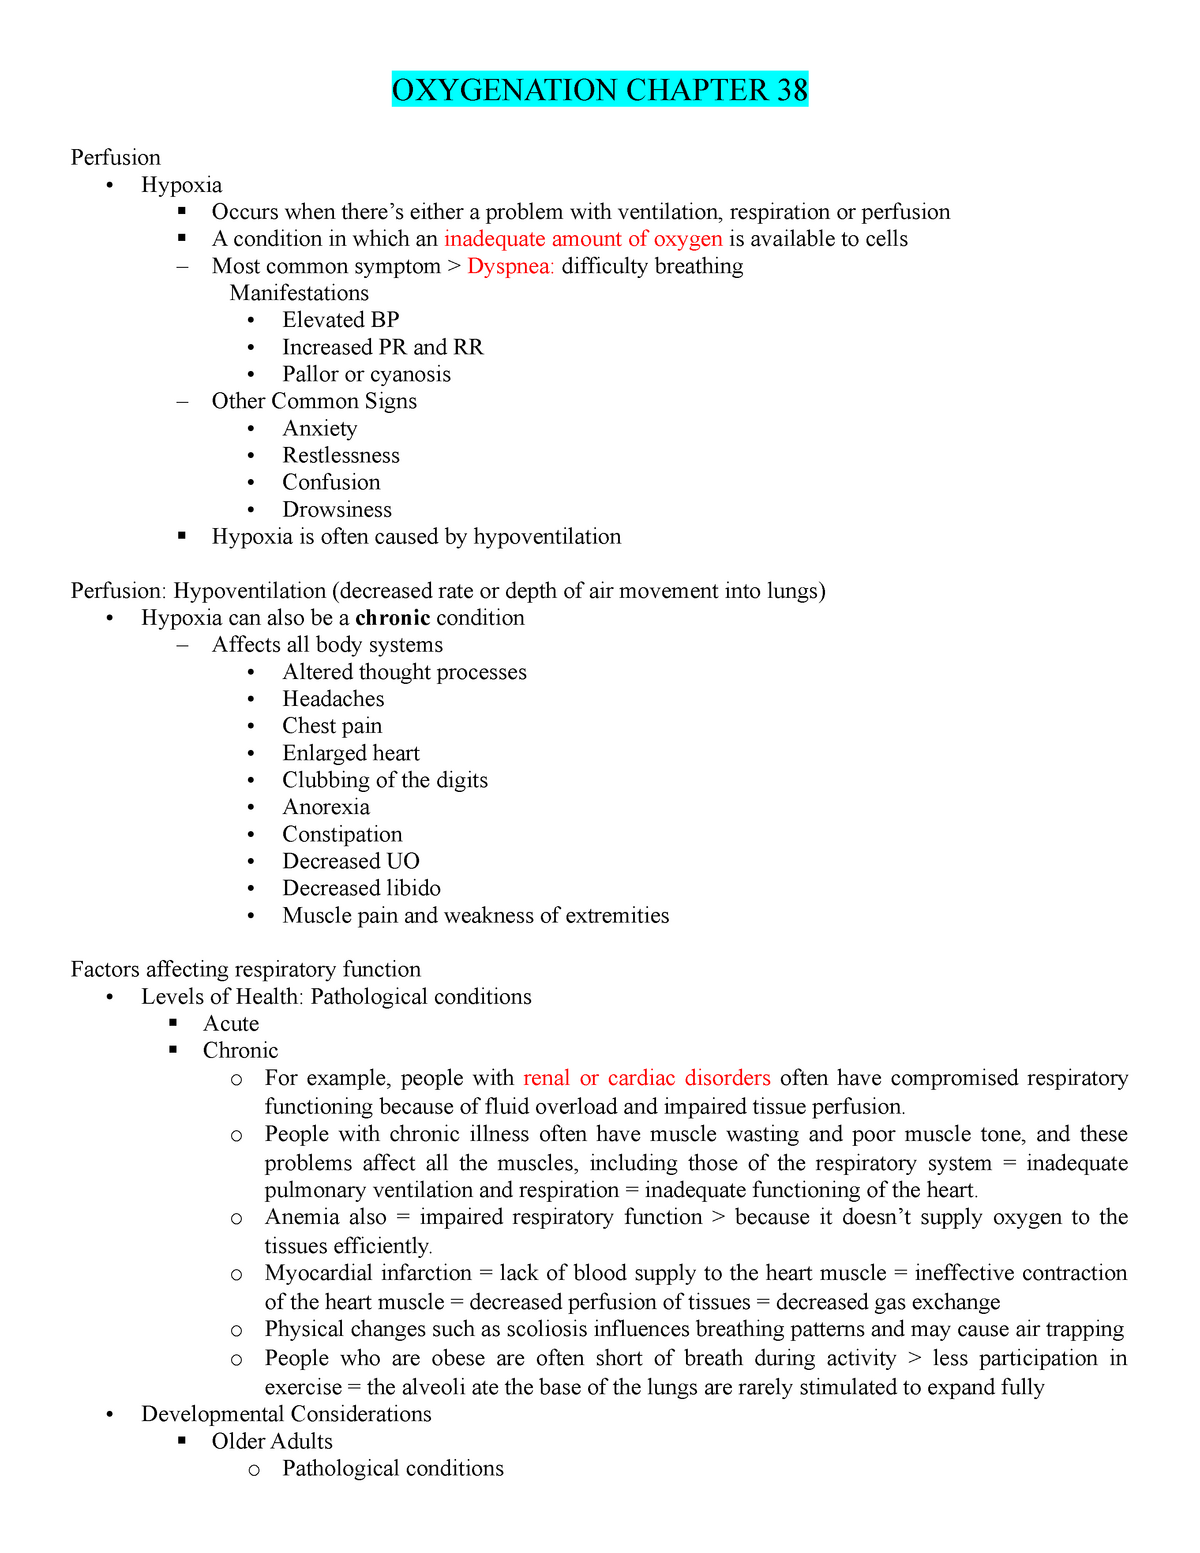 5  CH 38 Oxygenation - Summary Fundamentals of Nursing: the